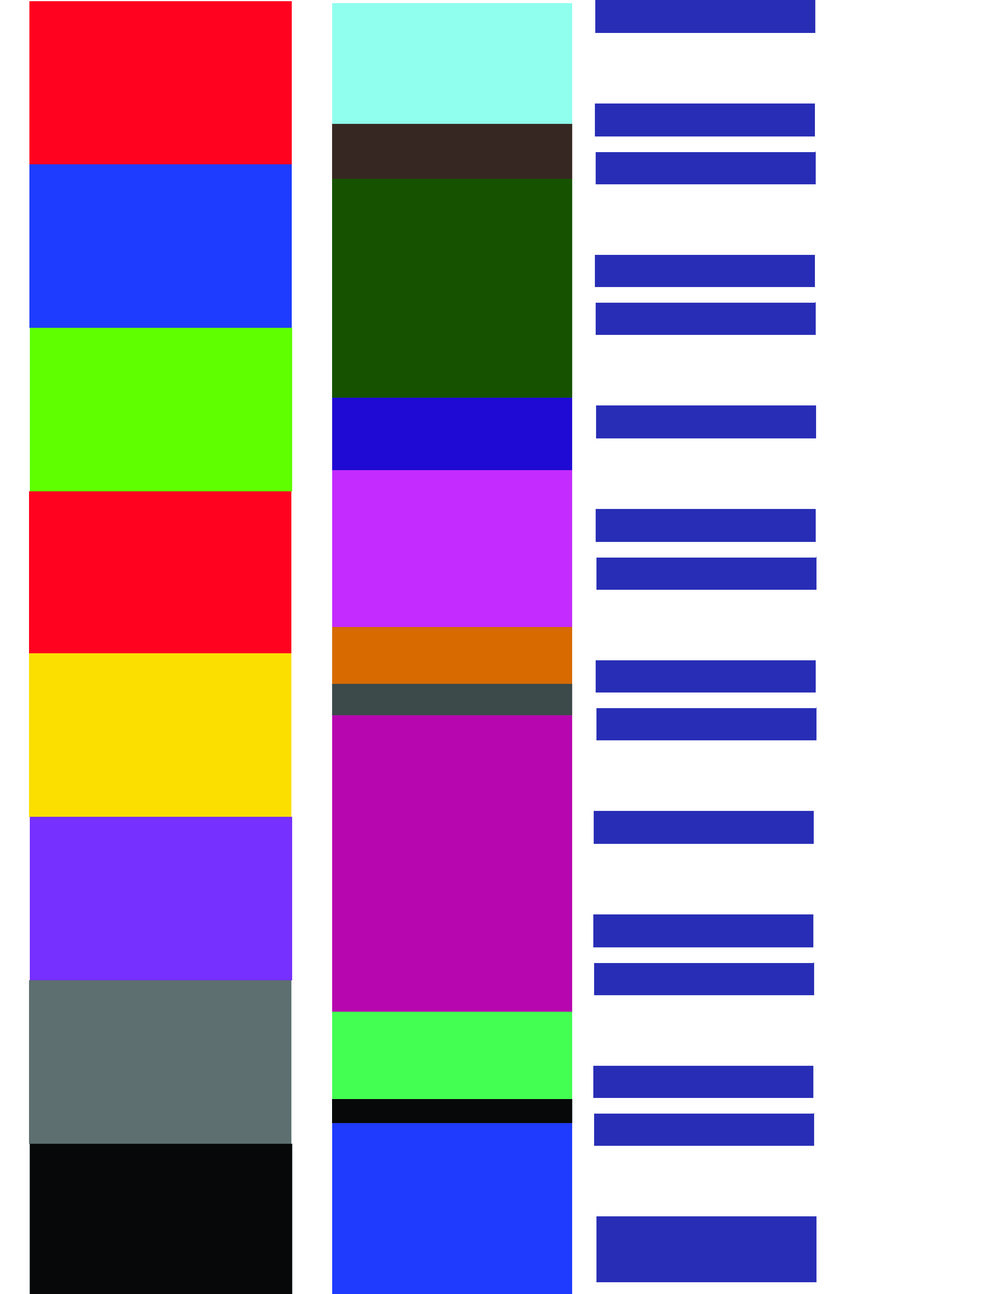 pcomp-colors-1.jpg